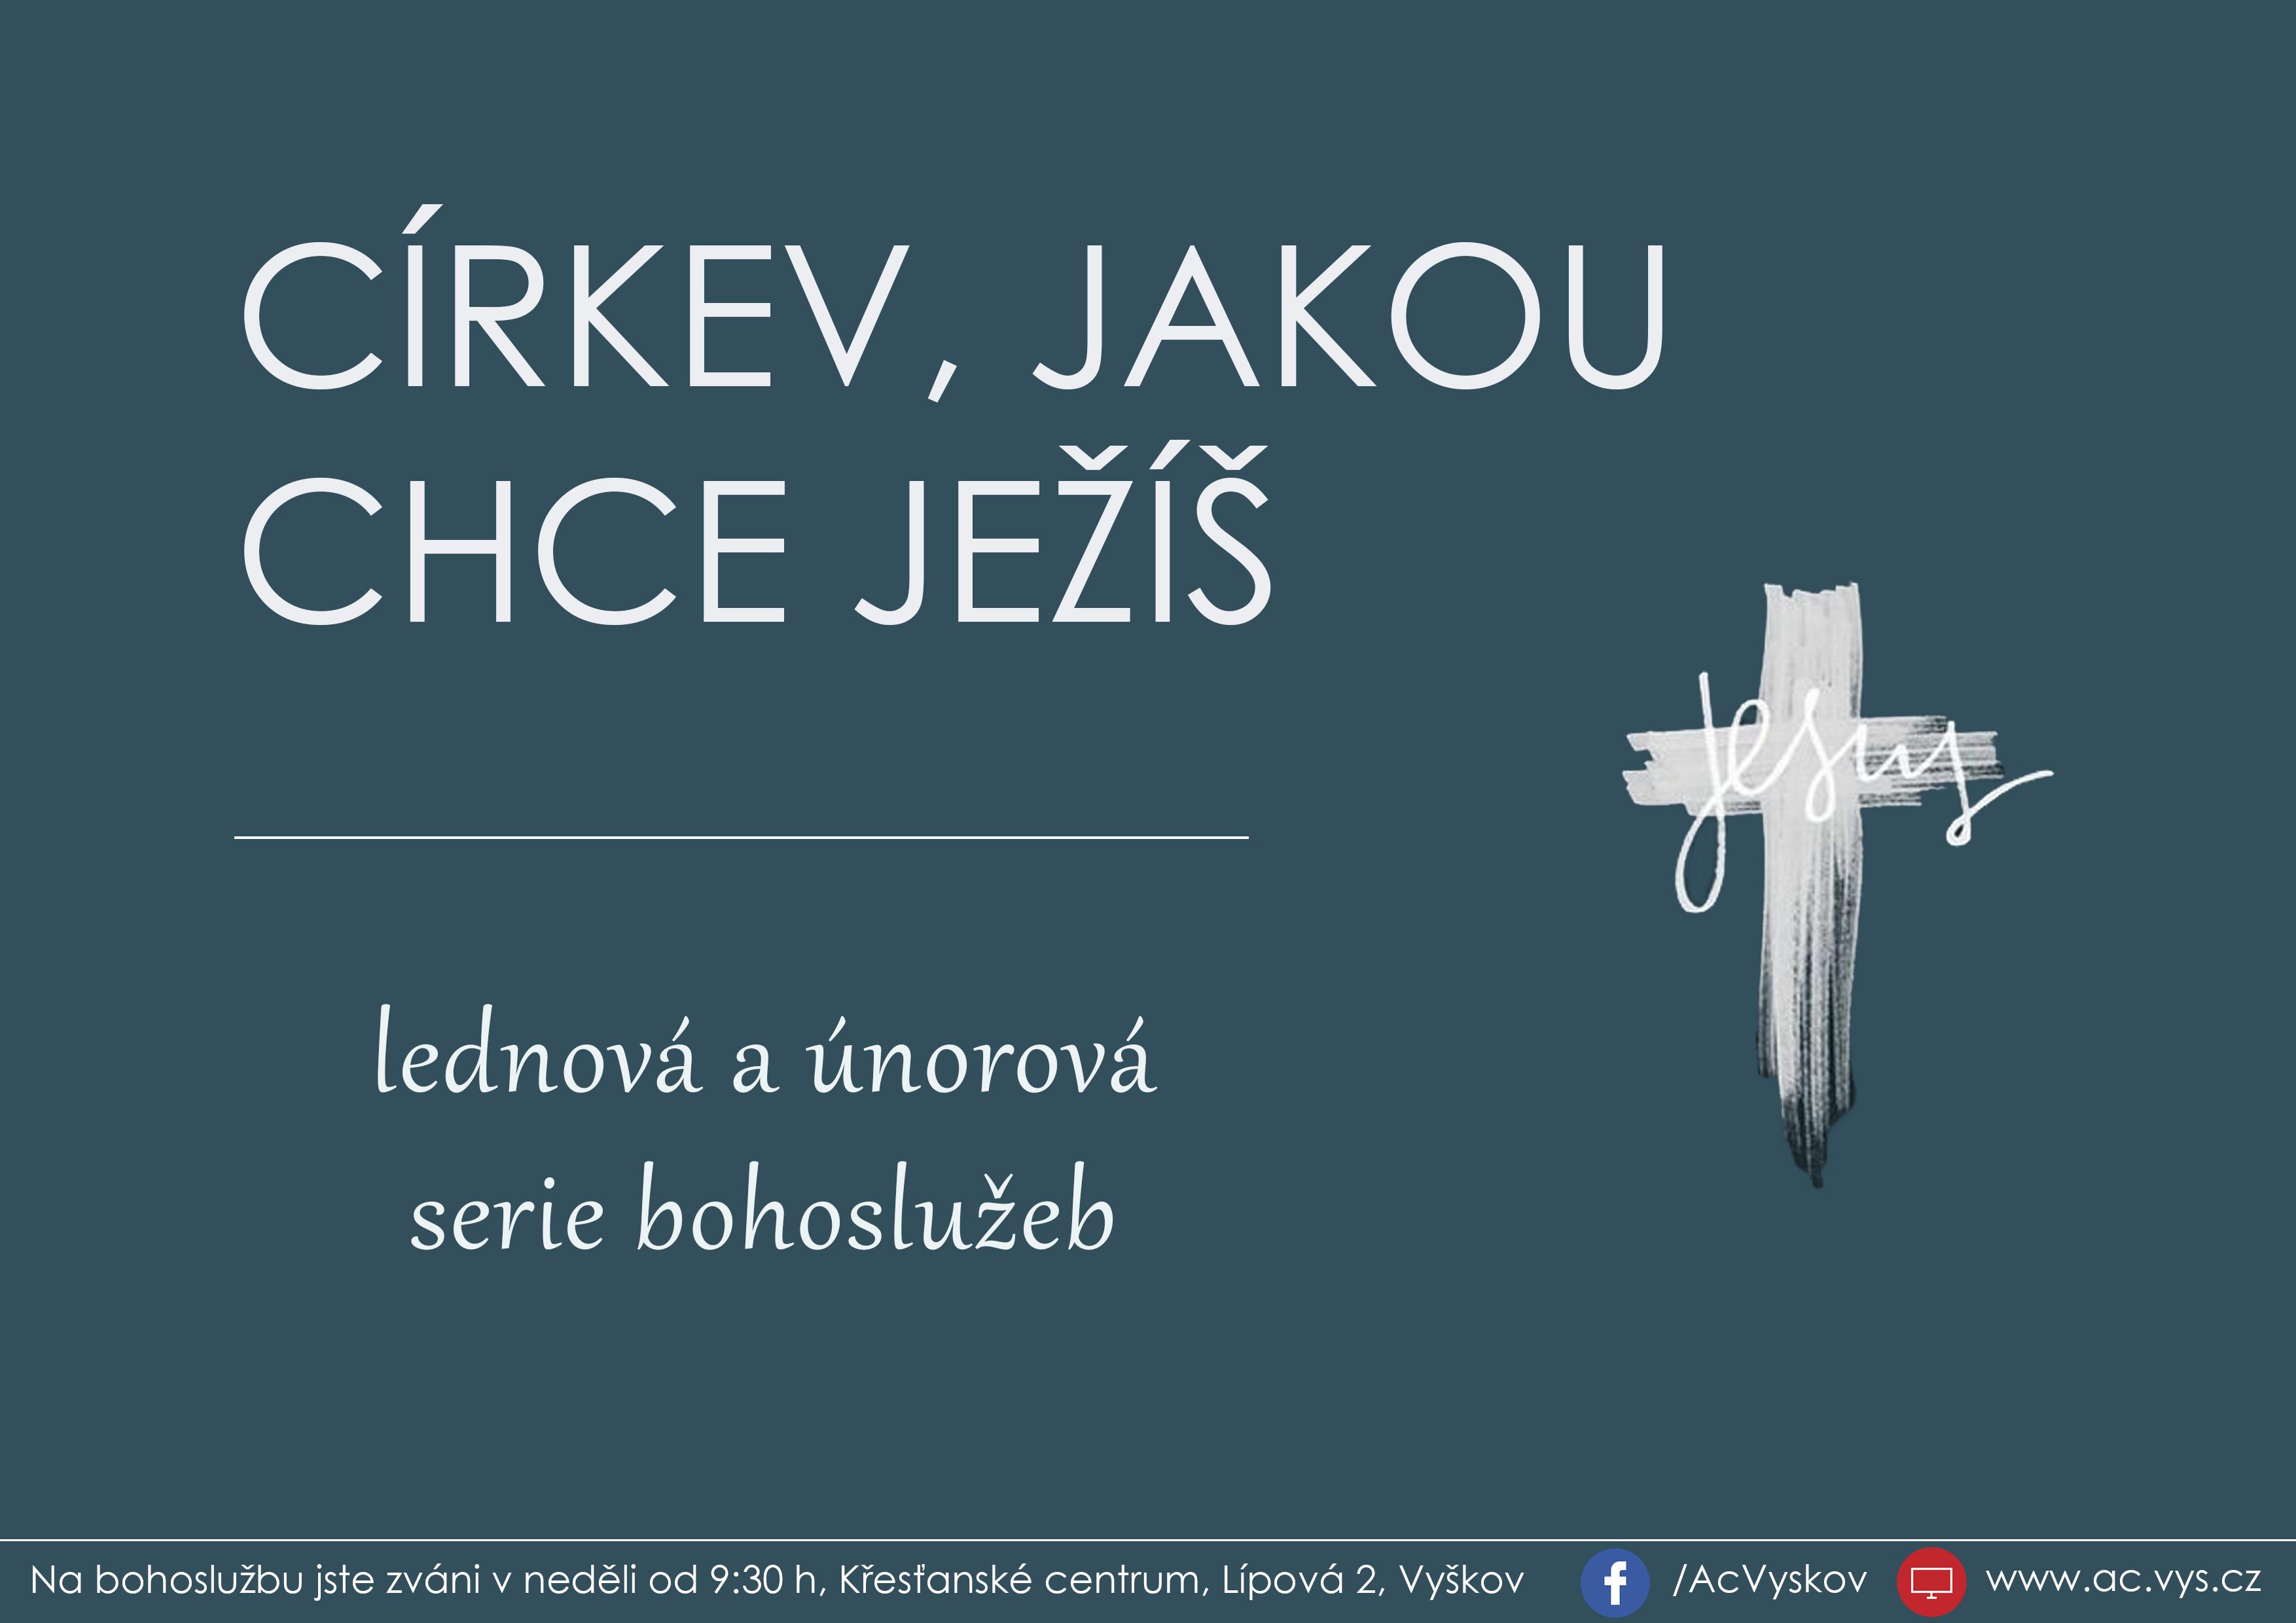 lednova_unorovaserie.jpg